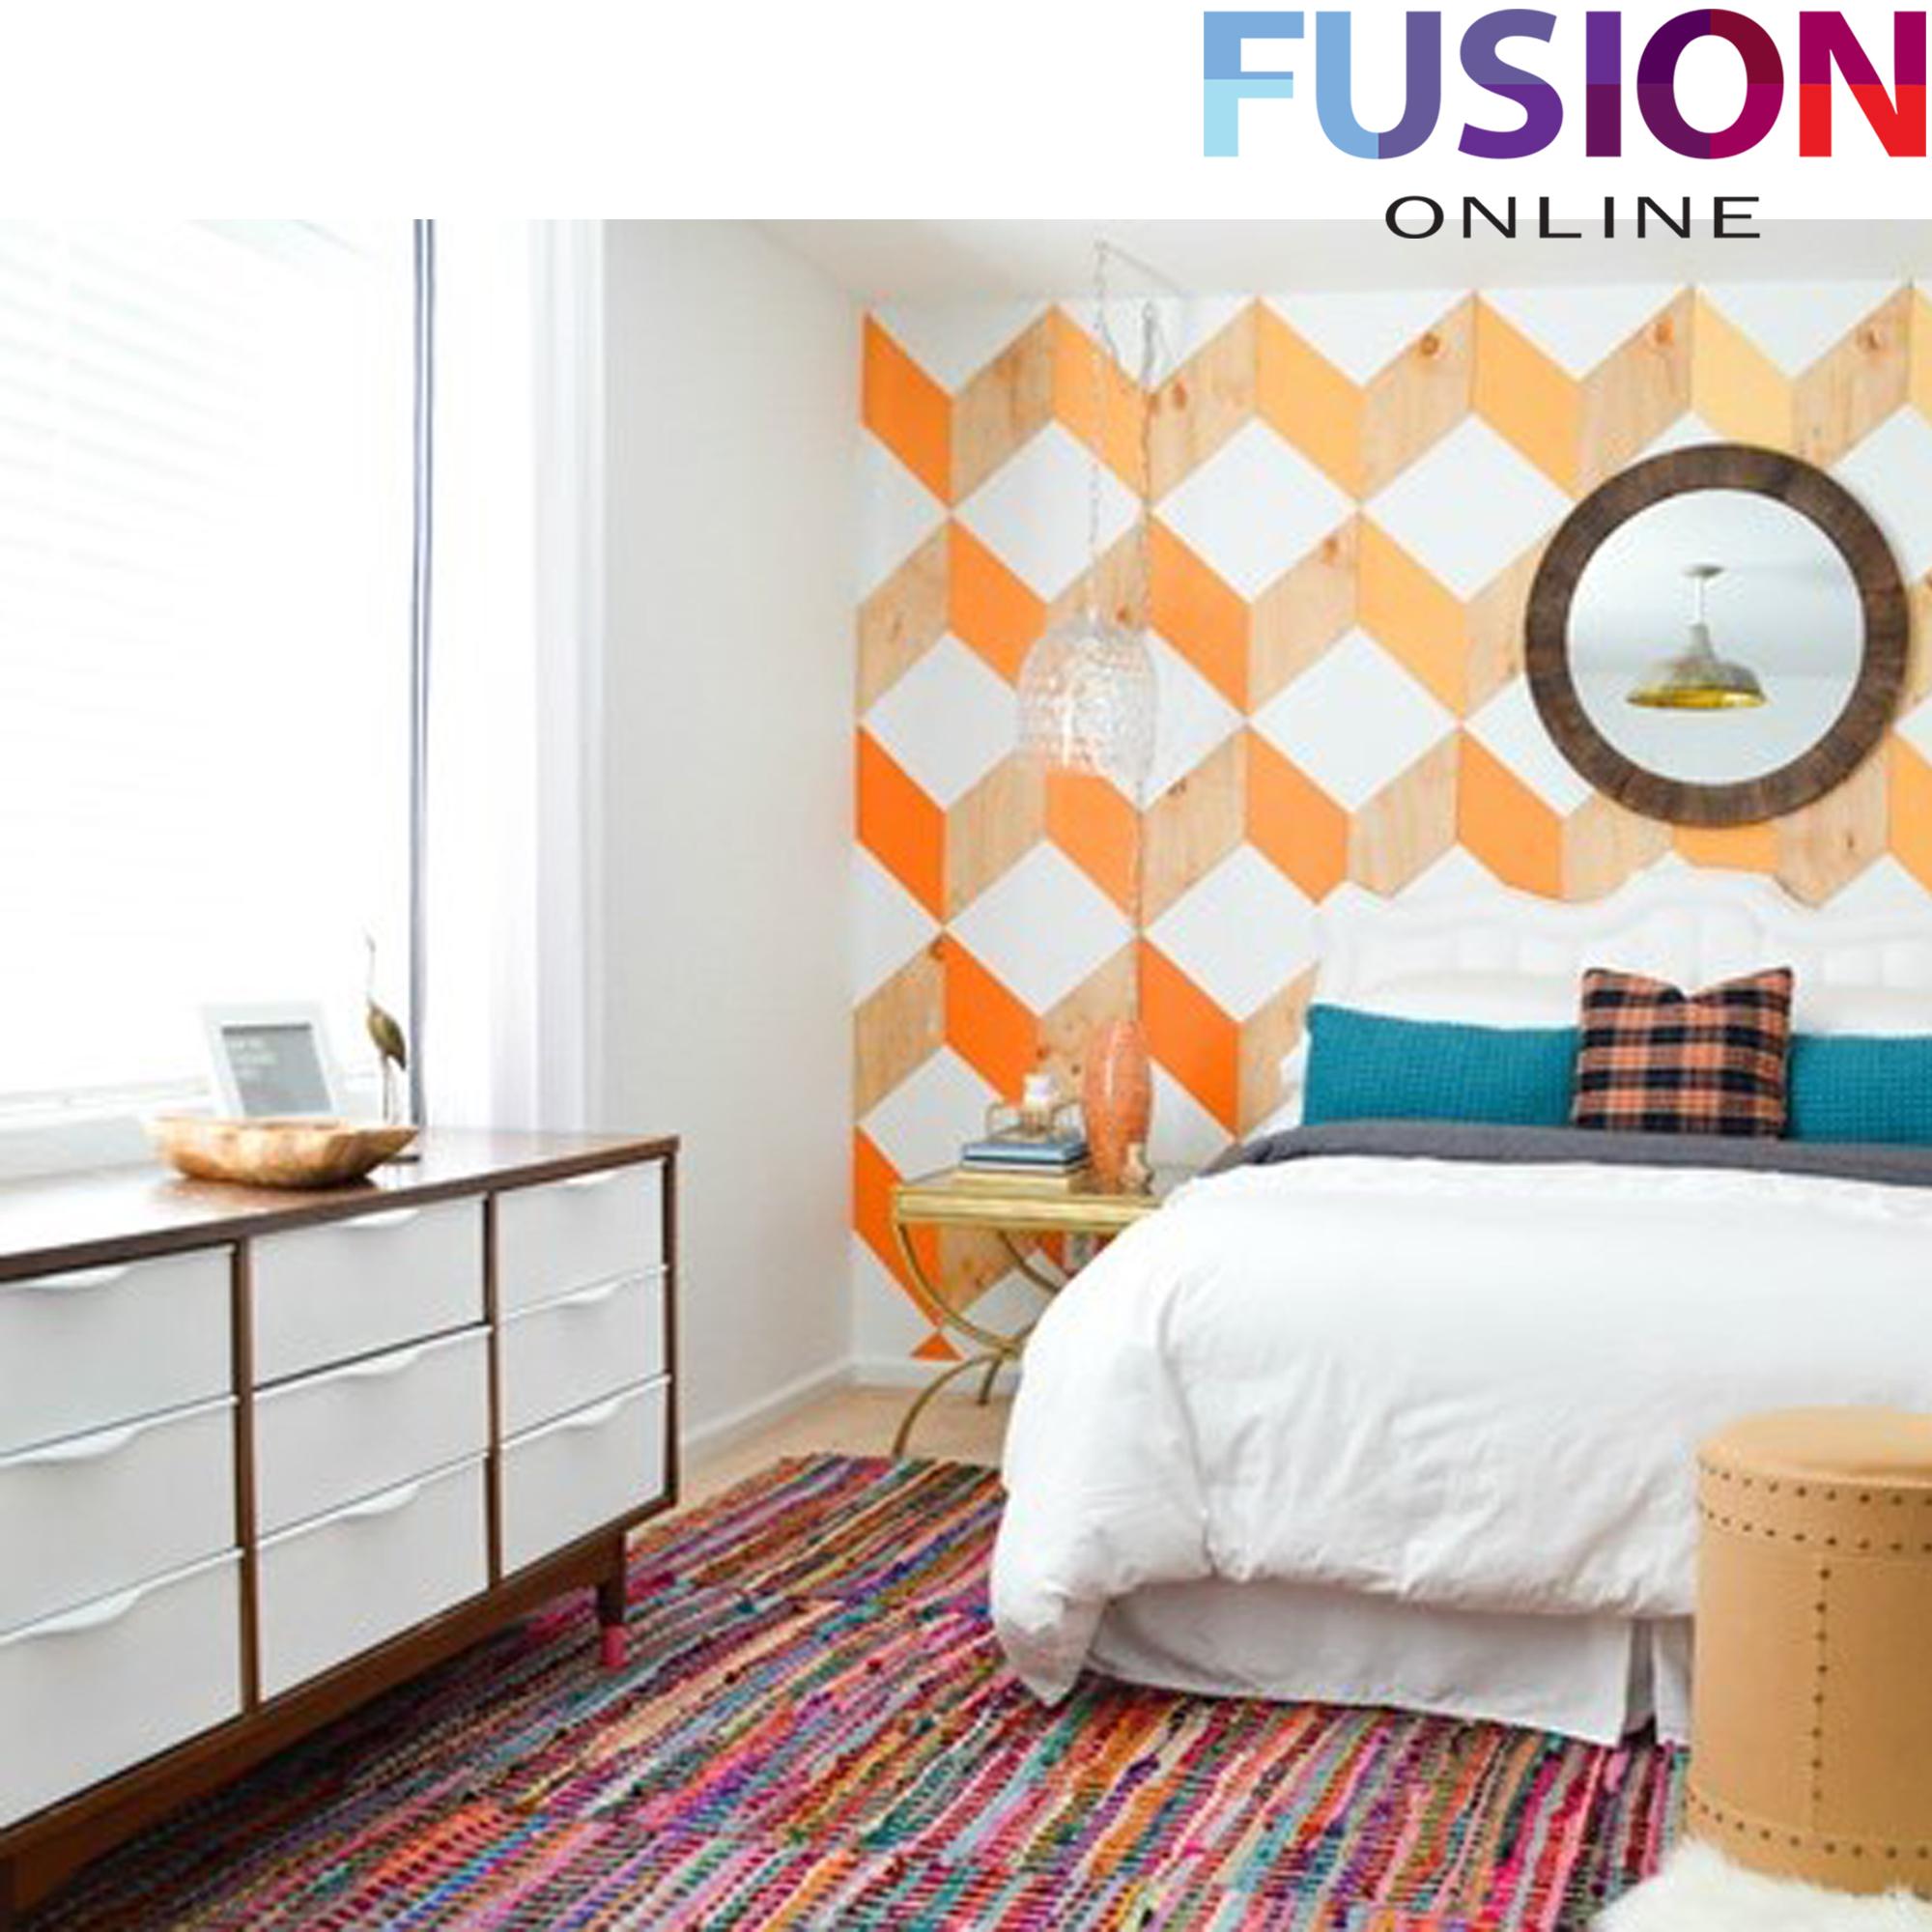 100 Cotton Handmade Multi Colour Chindi Rug Area Rag Rugs